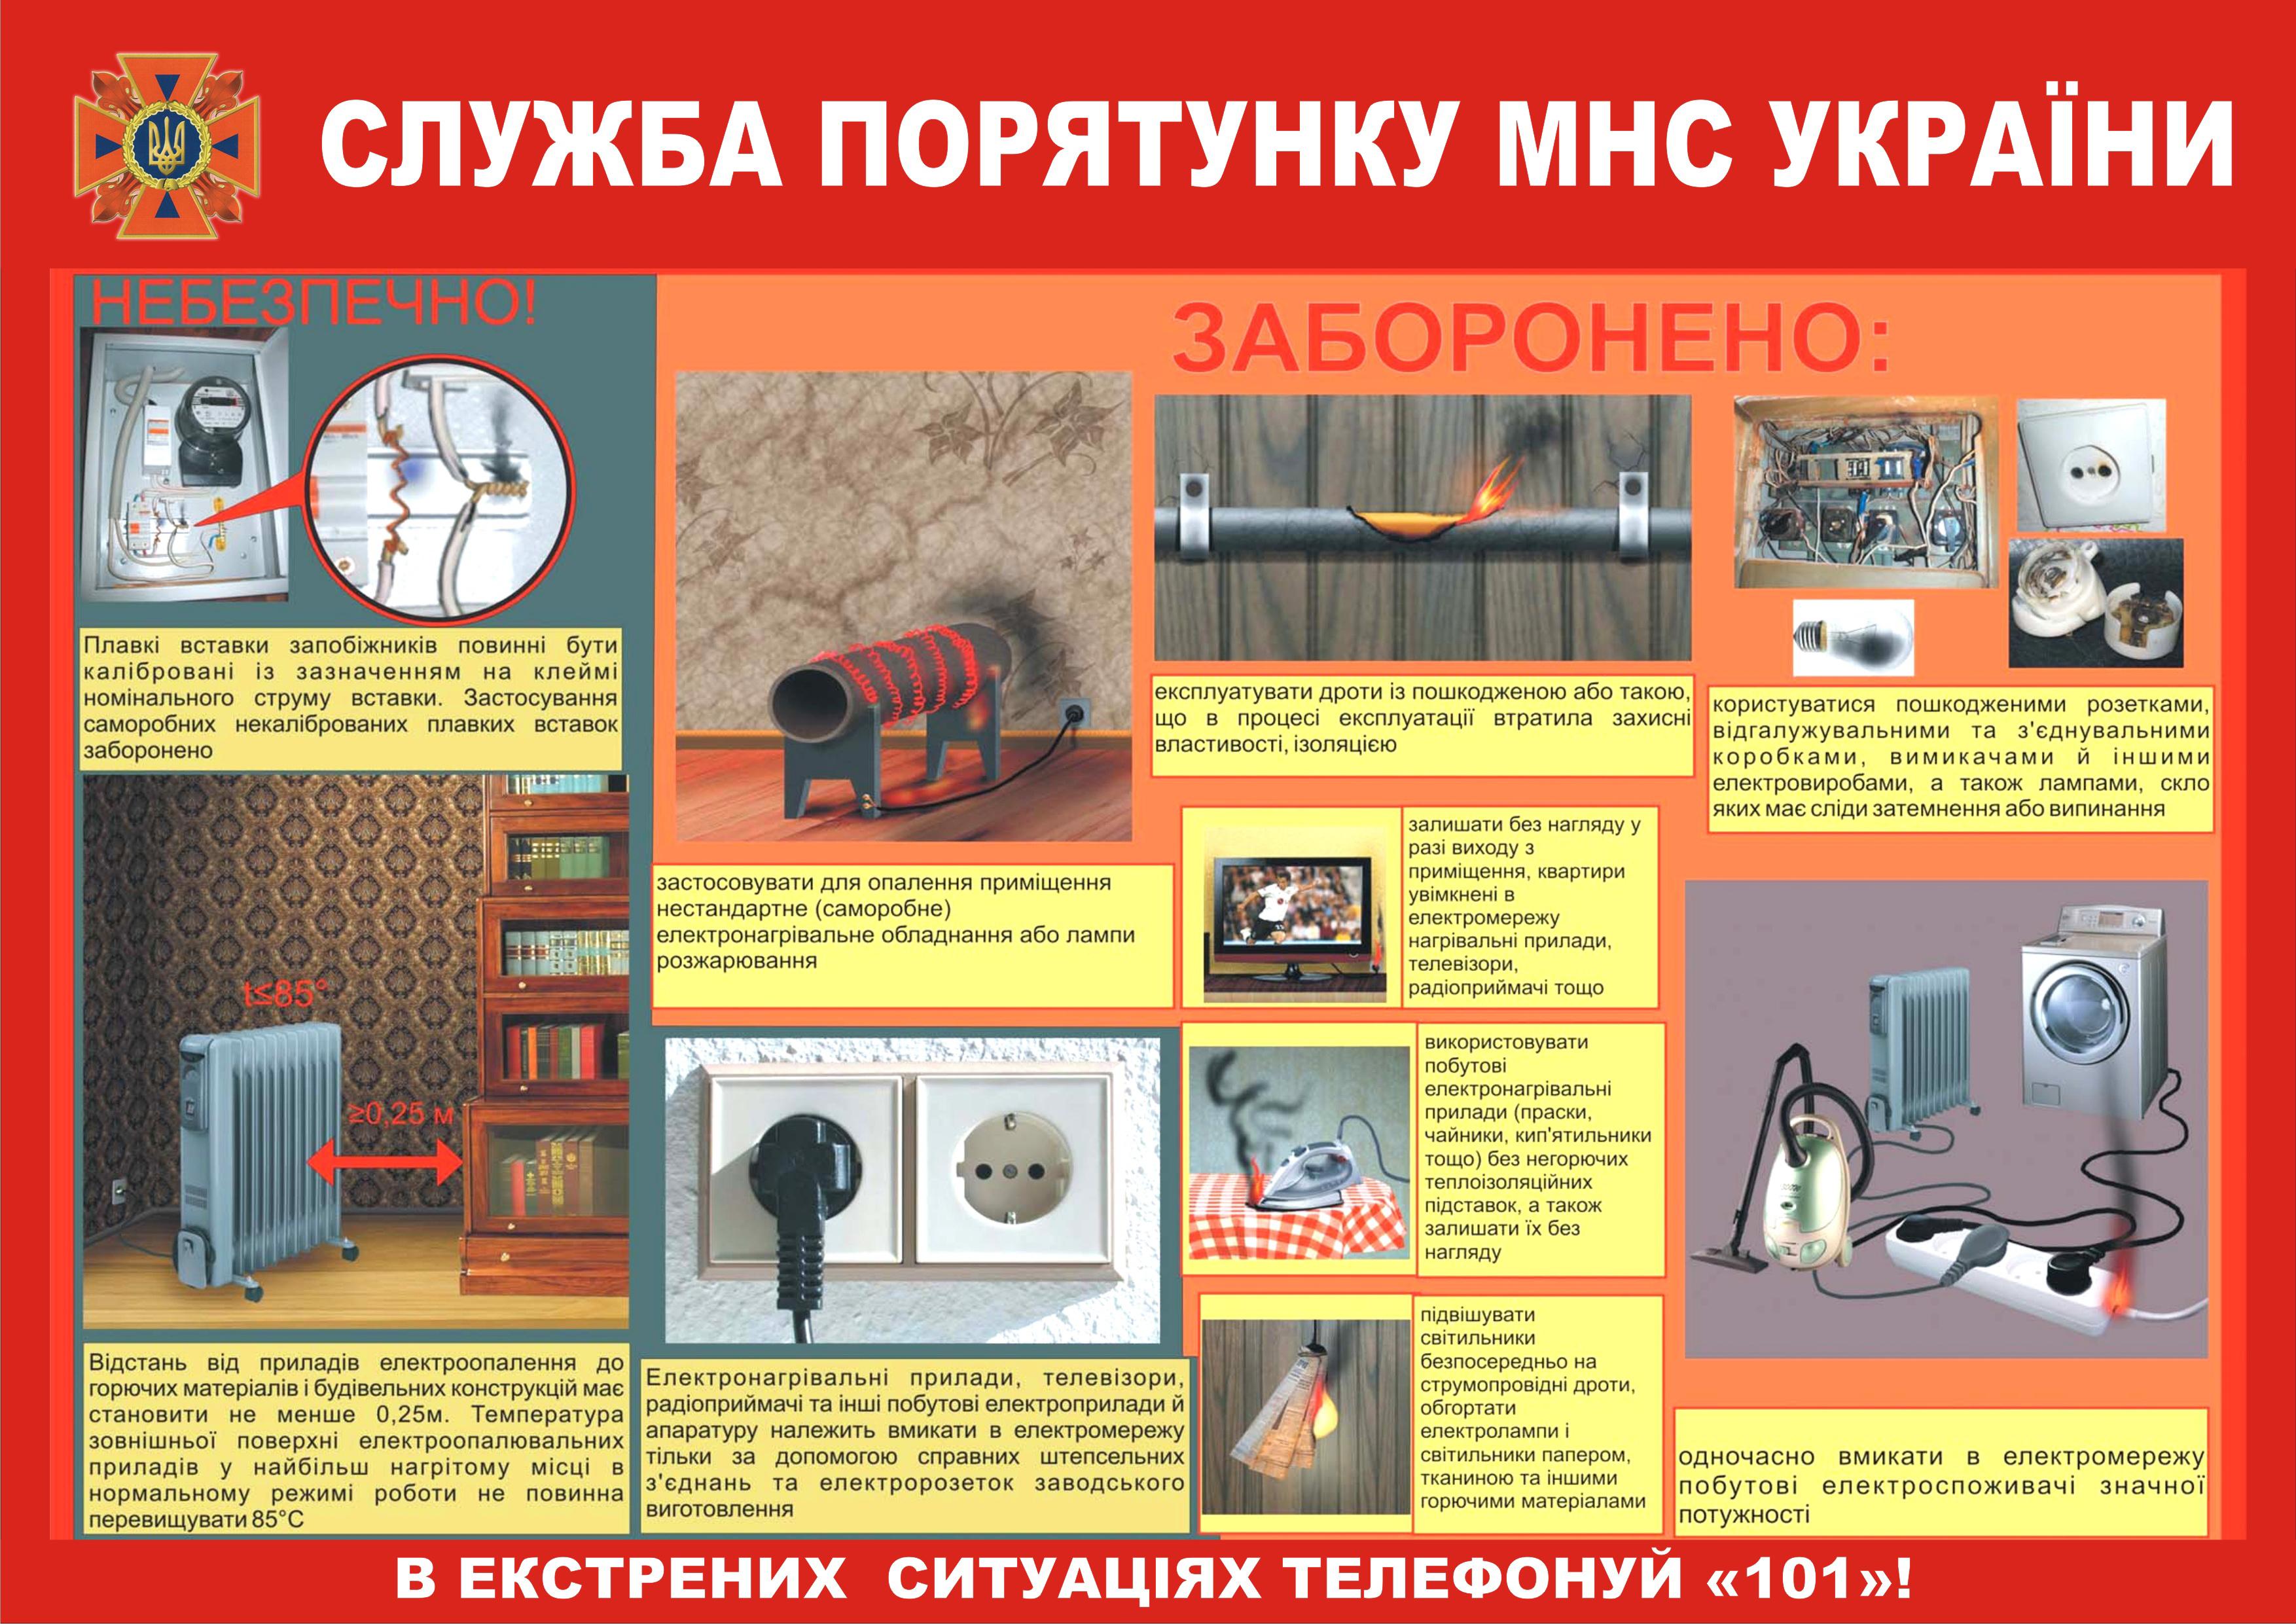 Служба порятунку МНС України